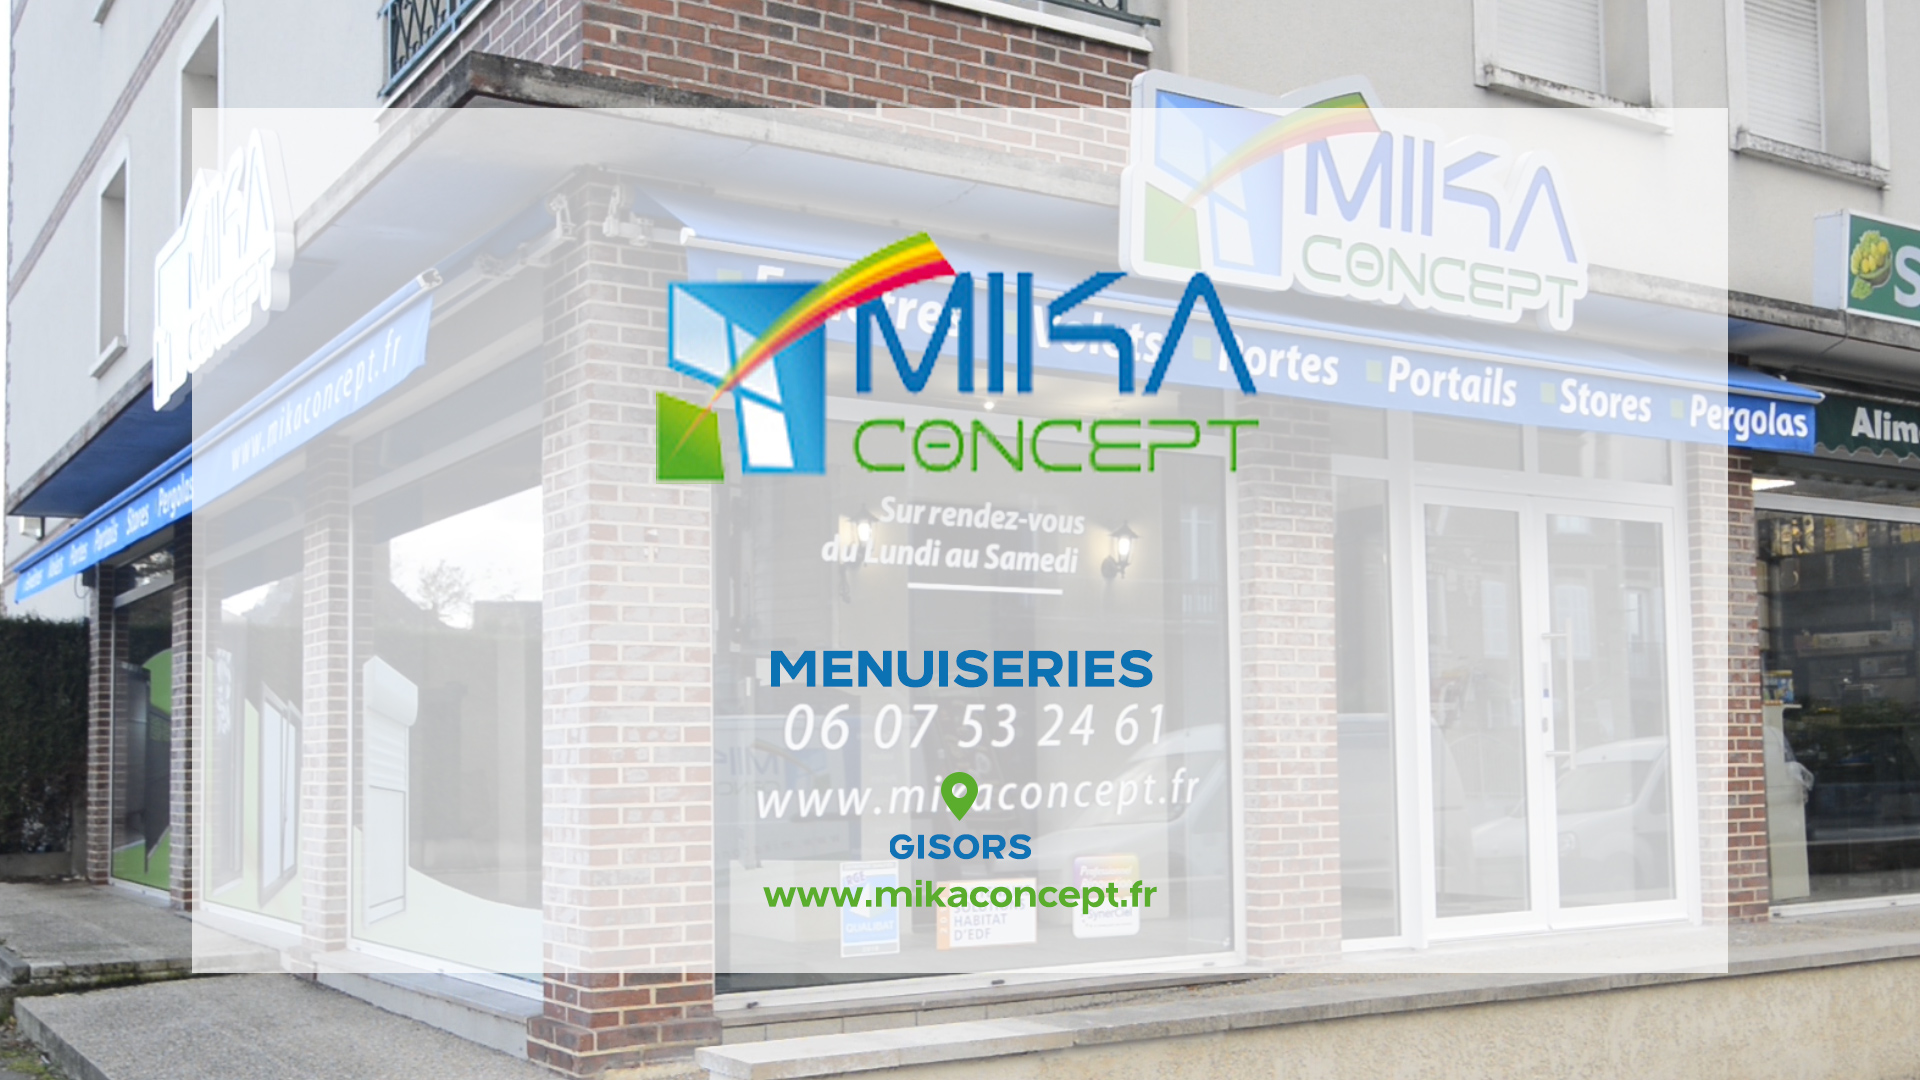 Mikaconcept - GISORS